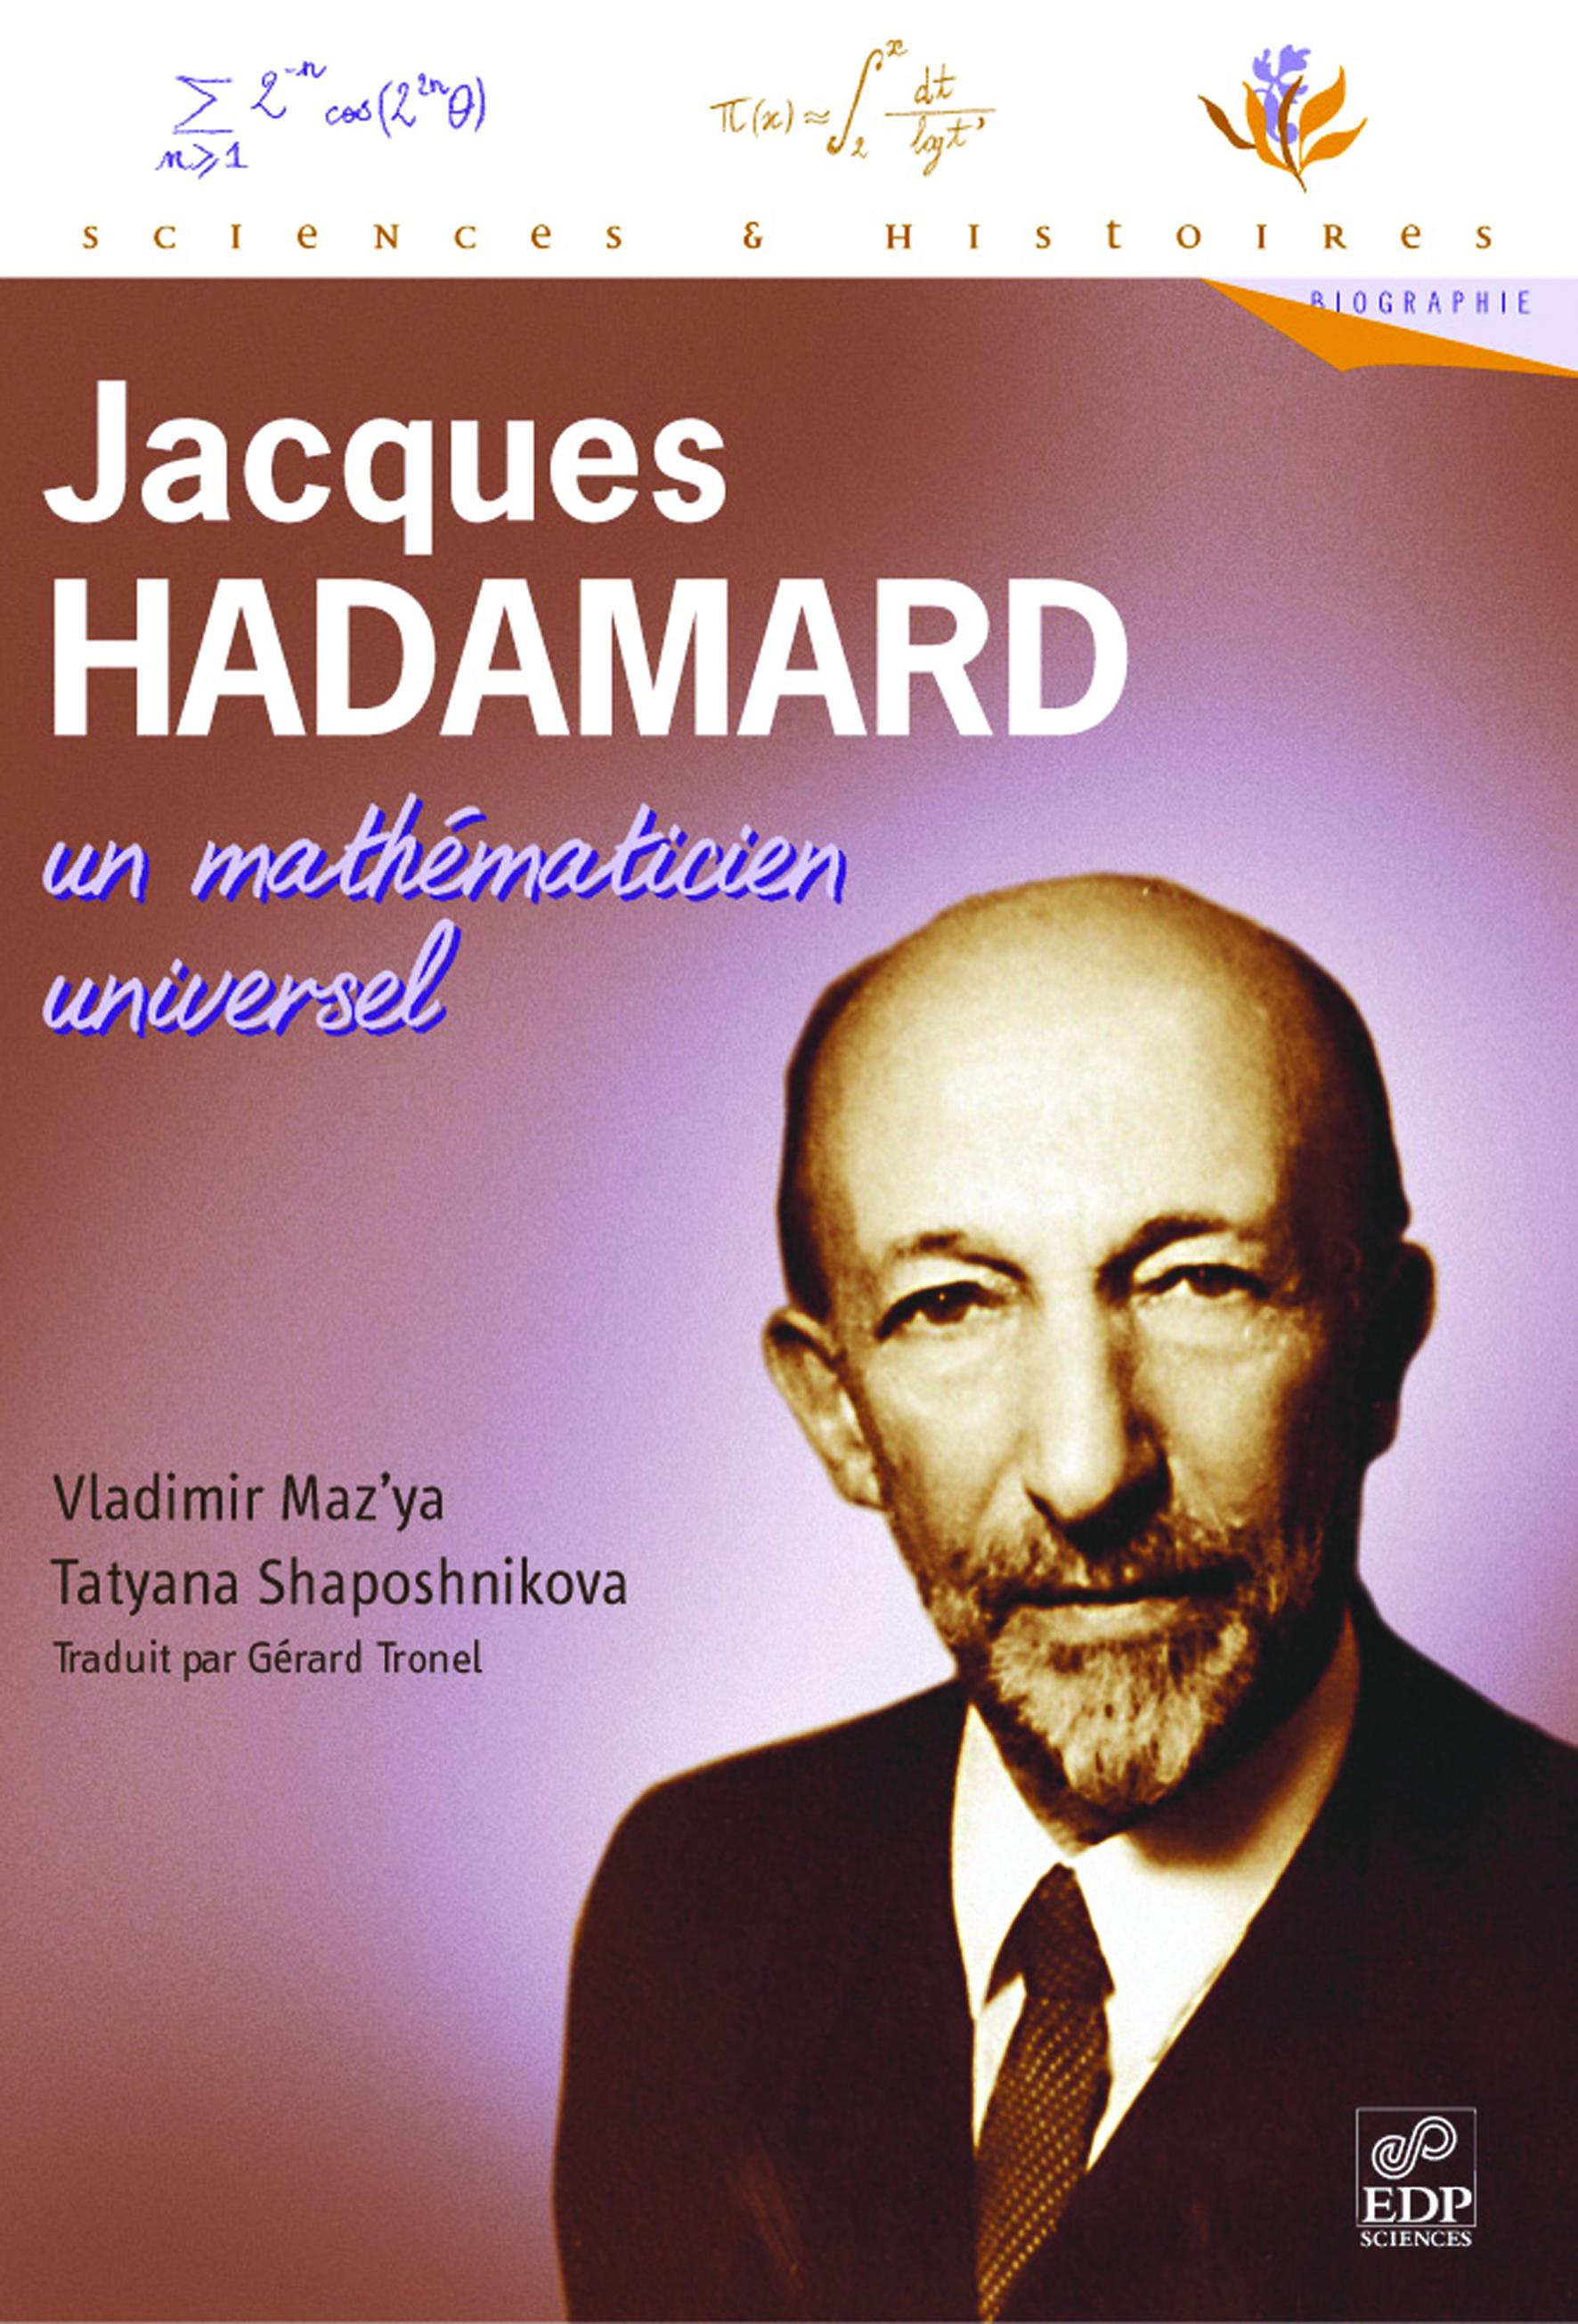 jacques_hadamard.jpg